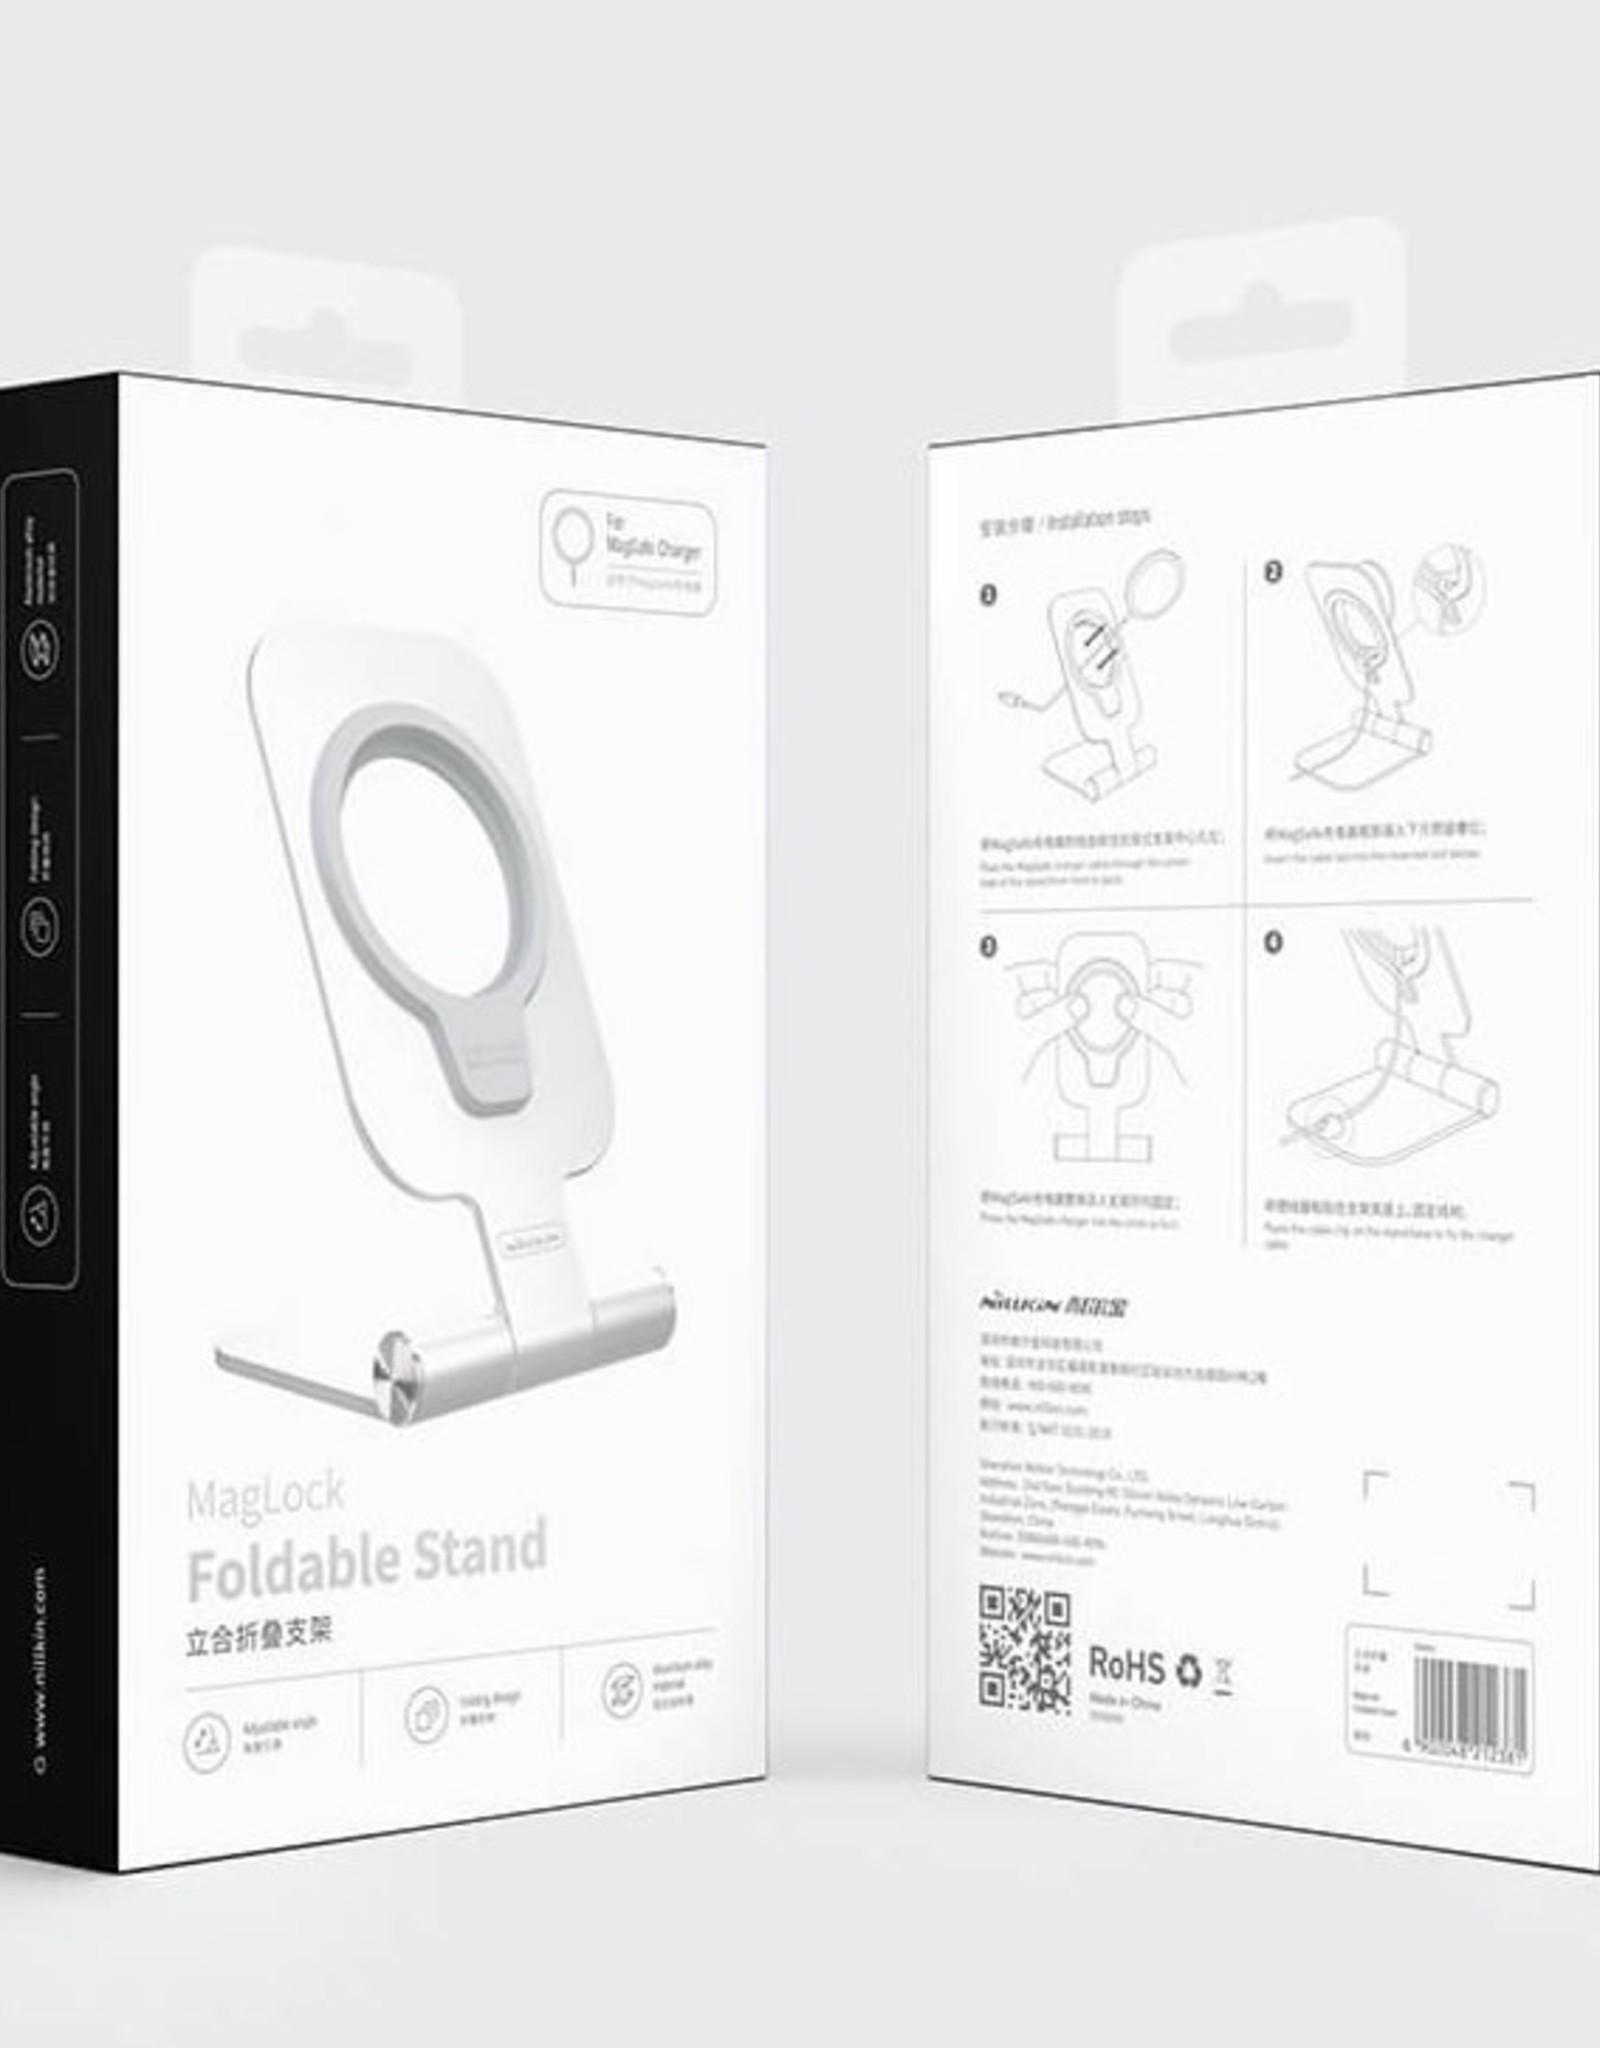 Nillkin Nillkin MagLock foldable stand